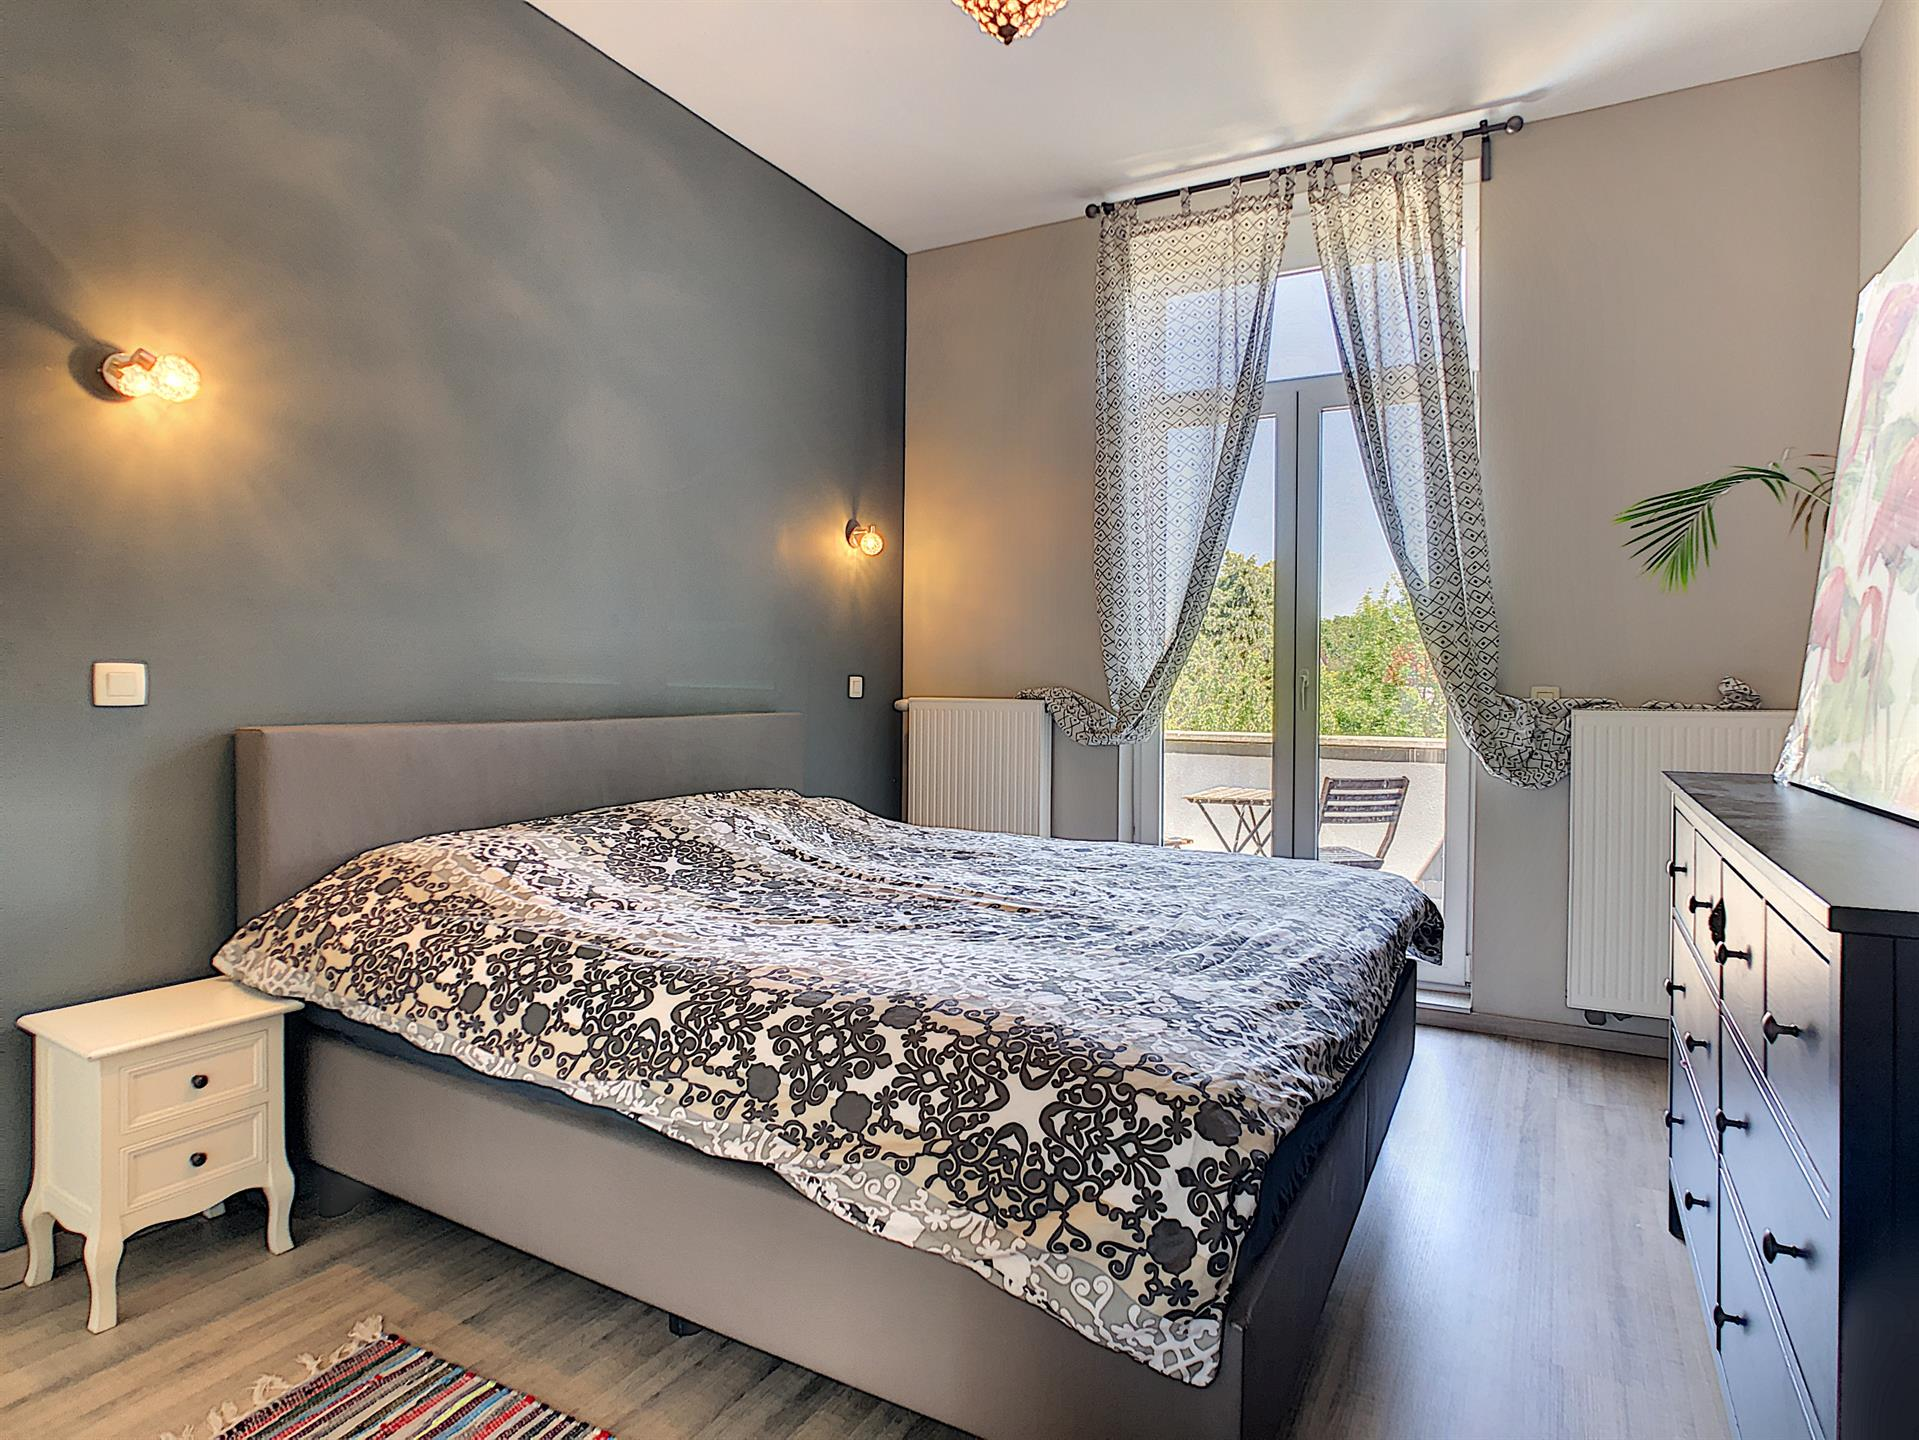 Maison - Dilbeek - #4392767-6